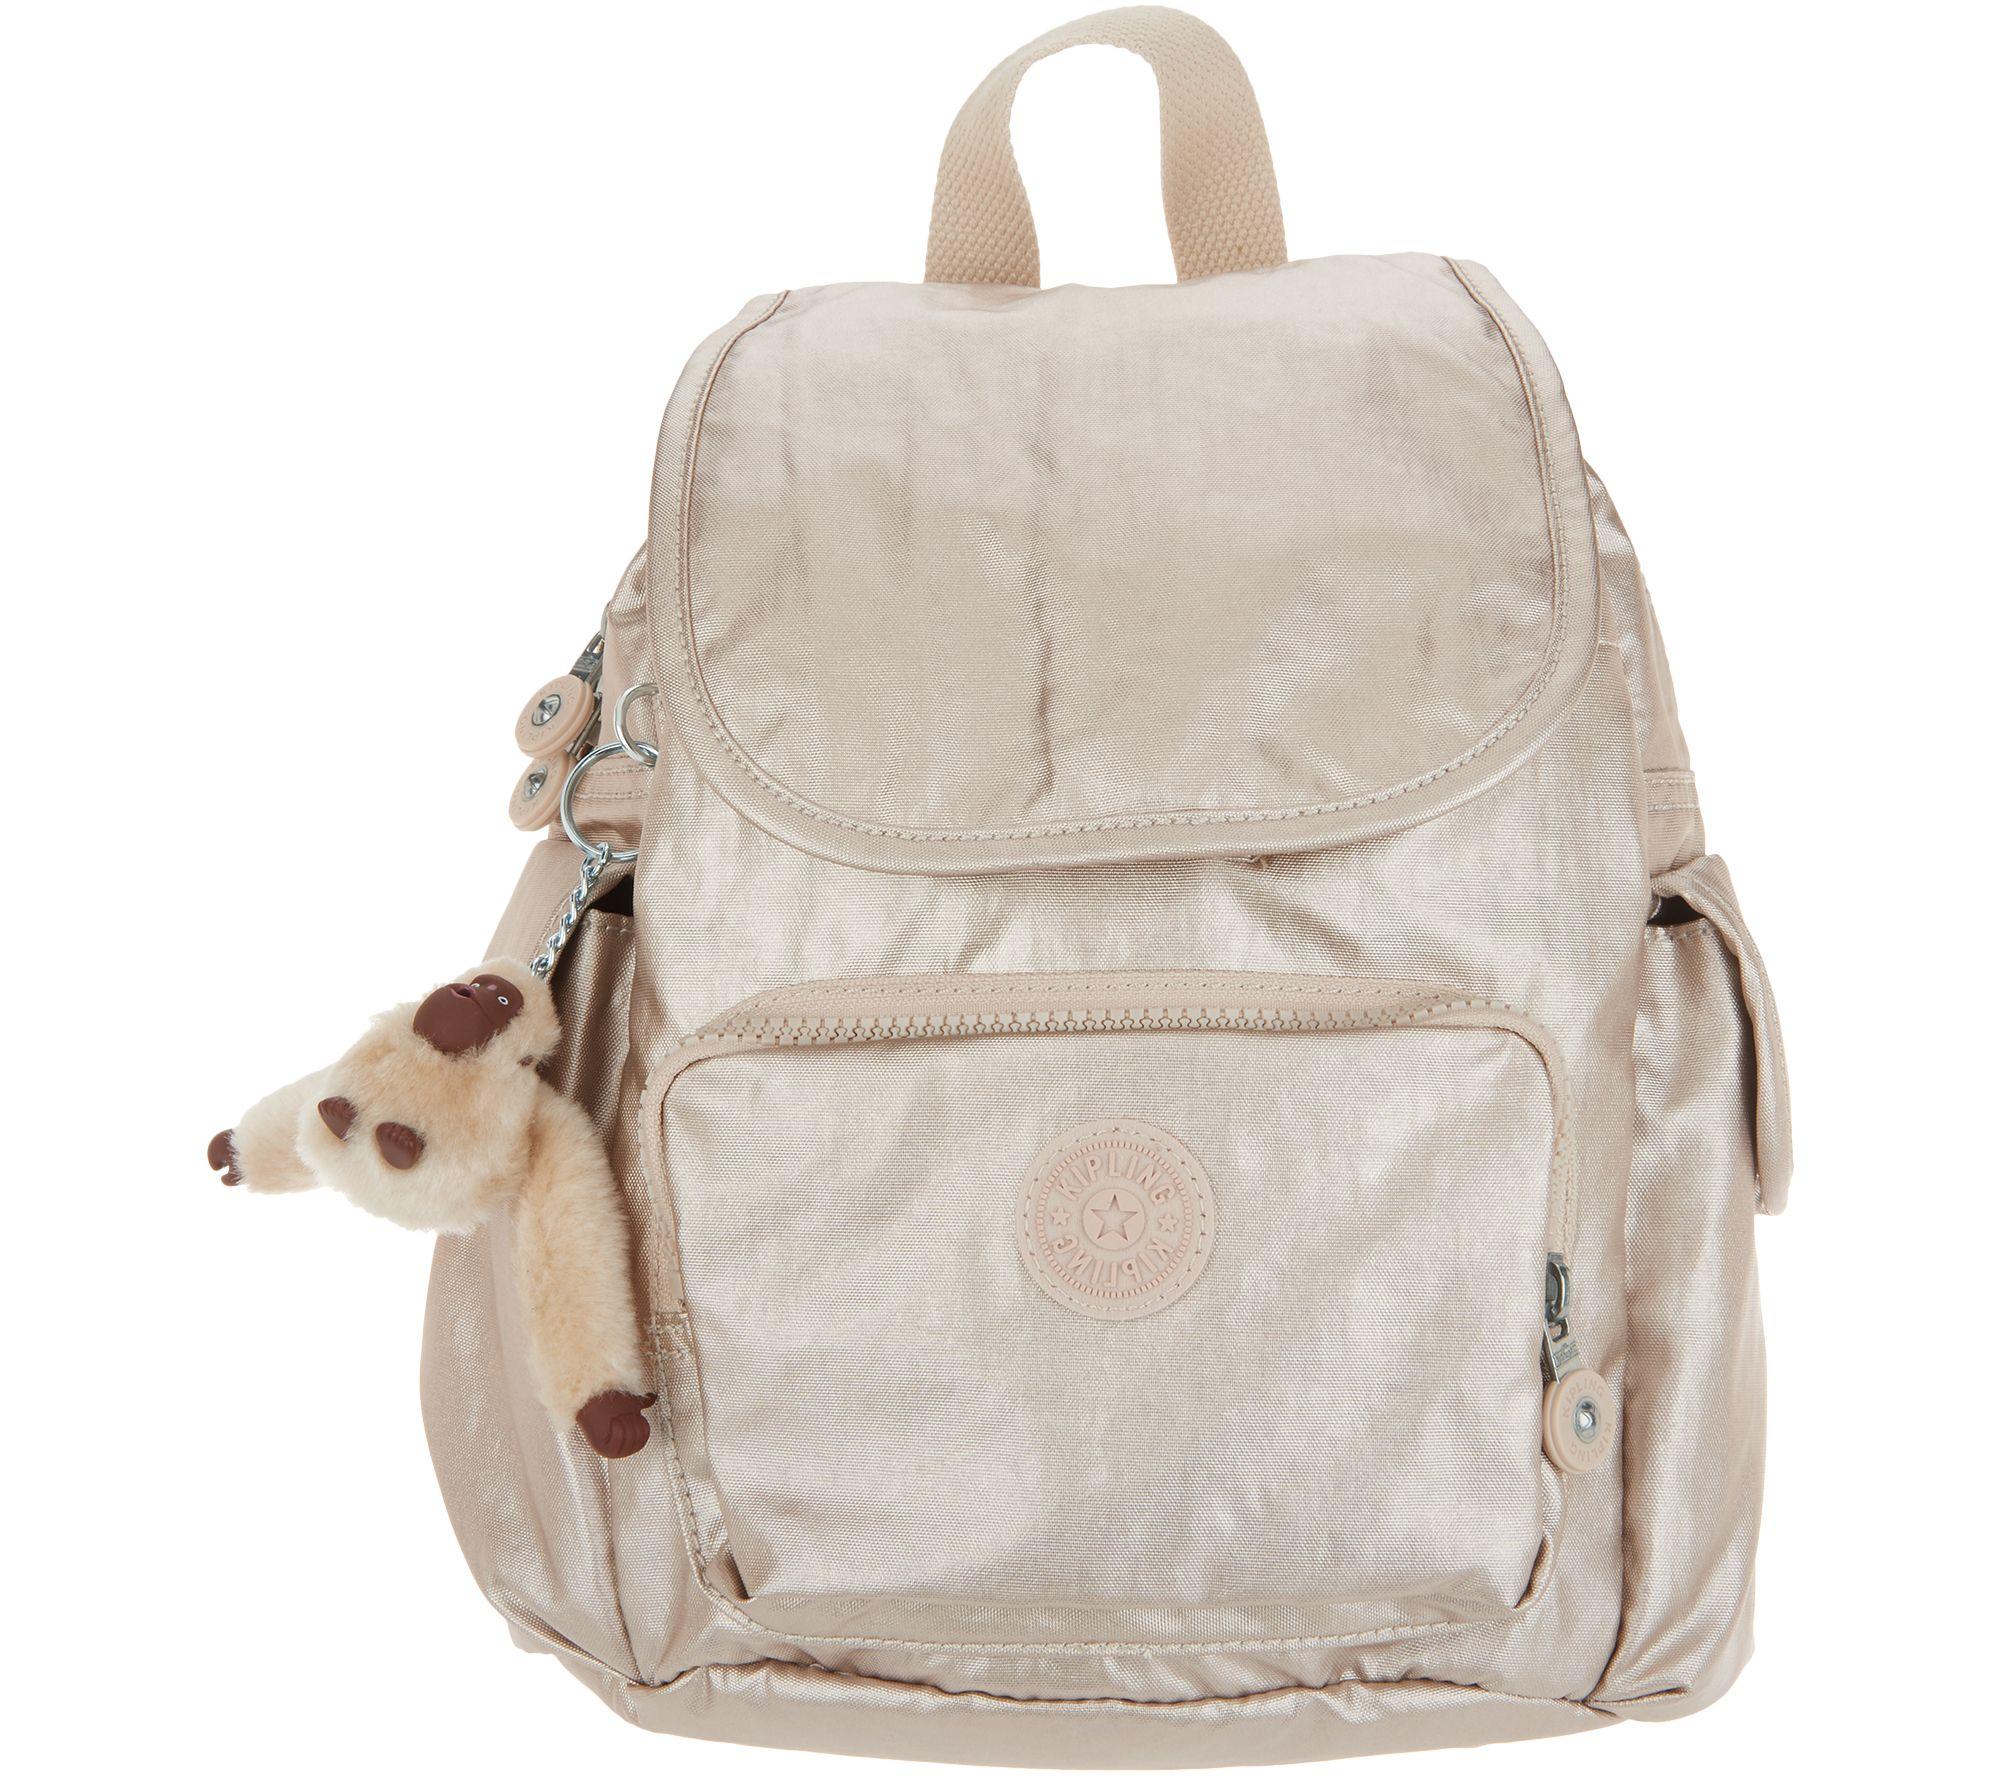 Kipling CityPack XS Backpack - Page 1 — QVC.com 3291bcfcc1